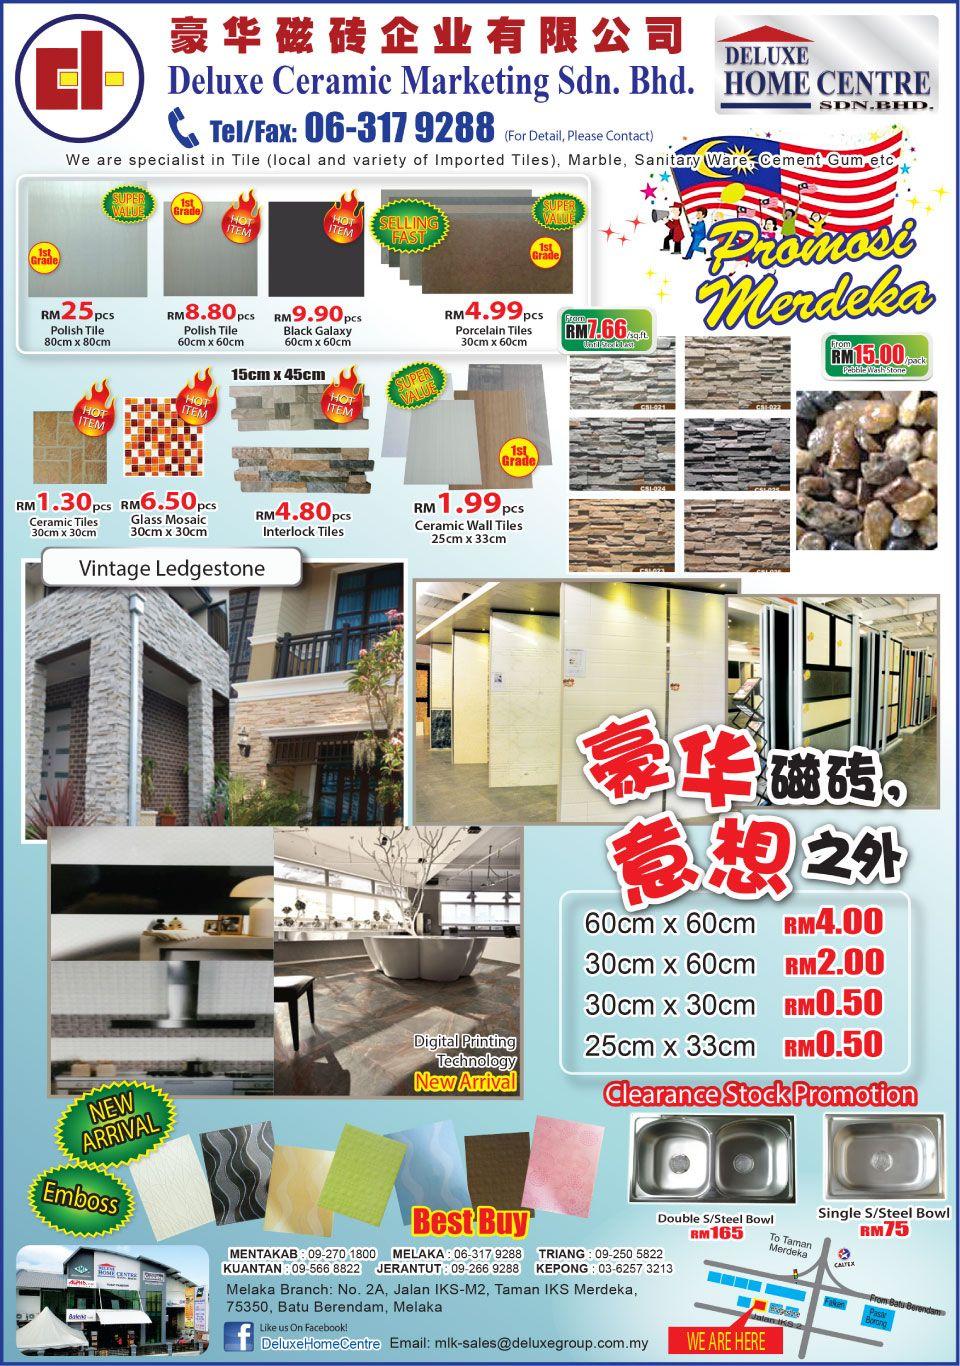 Deluxe ceramic marketing sdn bhd ceramic tiles in malaysia deluxe ceramic marketing sdn bhd ceramic tiles in malaysia balena ceramic tiles in malaysia dailygadgetfo Images